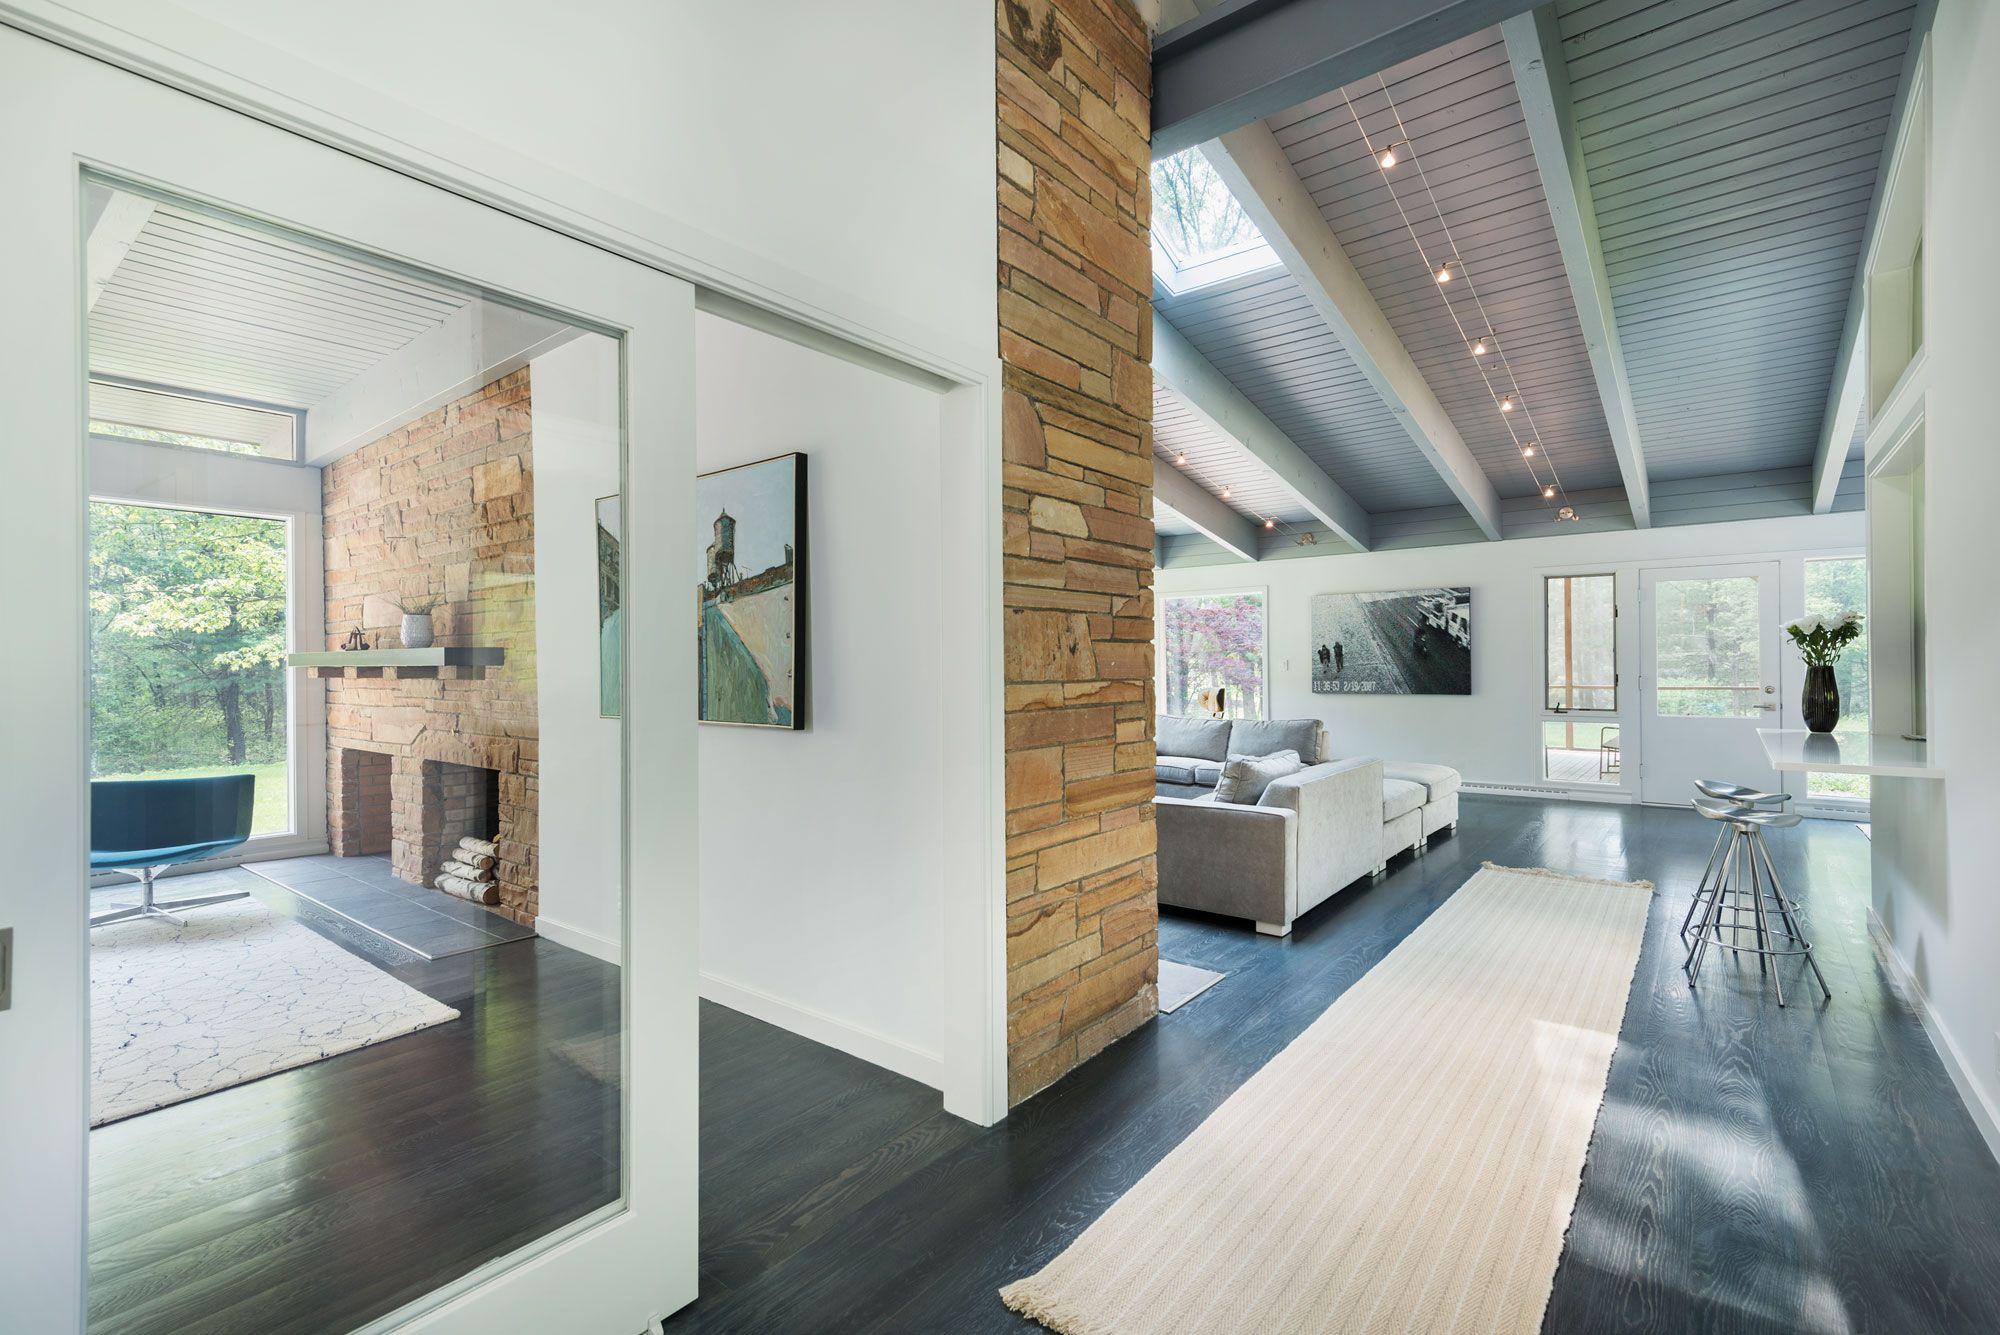 Mid-Century Modern Home Design by Flavin Architects - CAANdesign ...